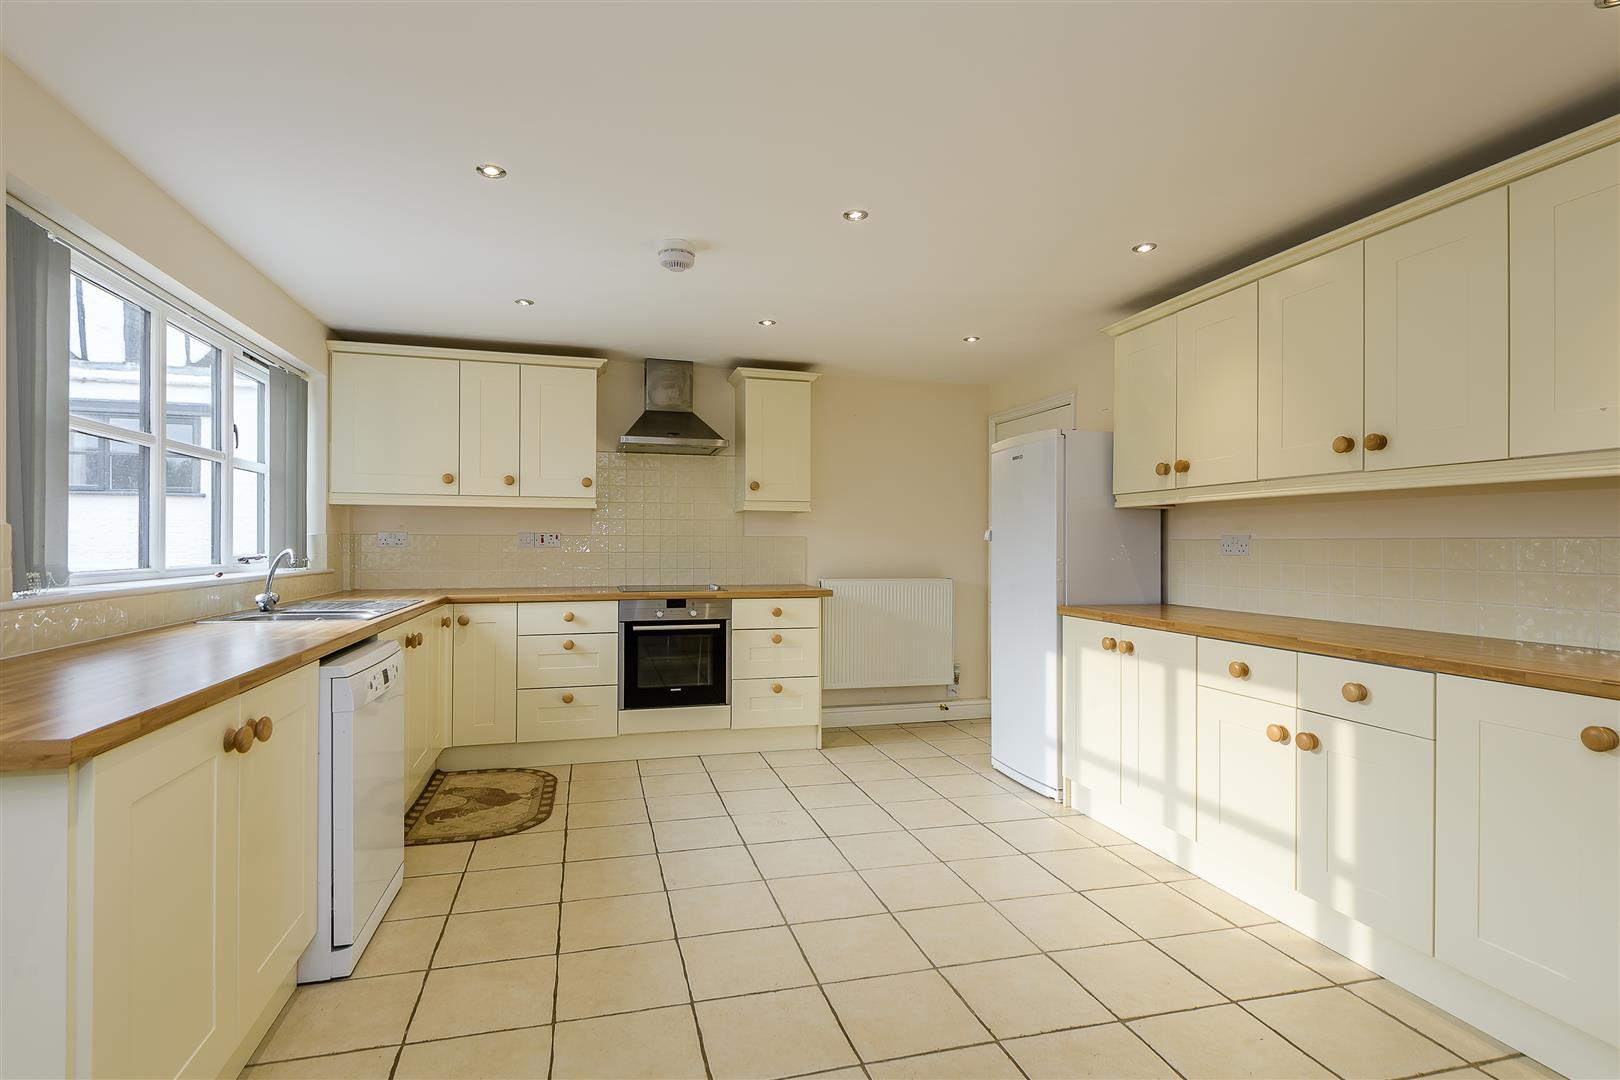 4 bedroom detached for sale in huntingdon